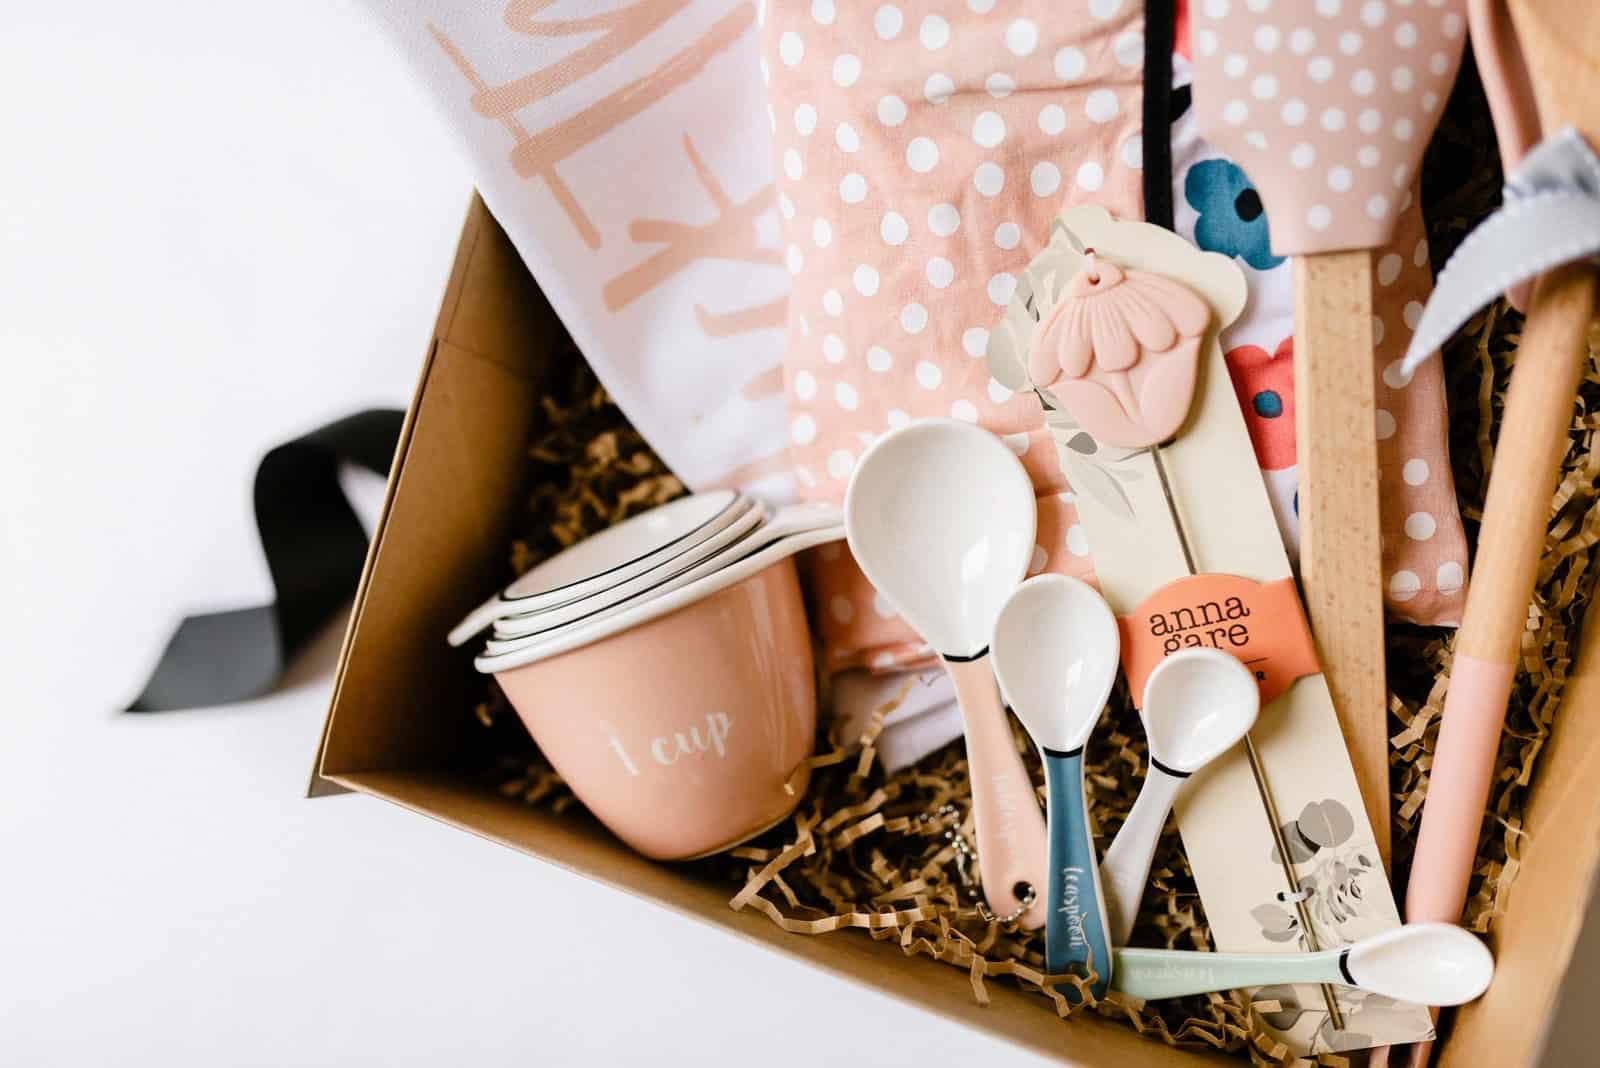 A hamper of baking goodies - pink enamel measuring cups, measuring spoons, tea towels and cake testers